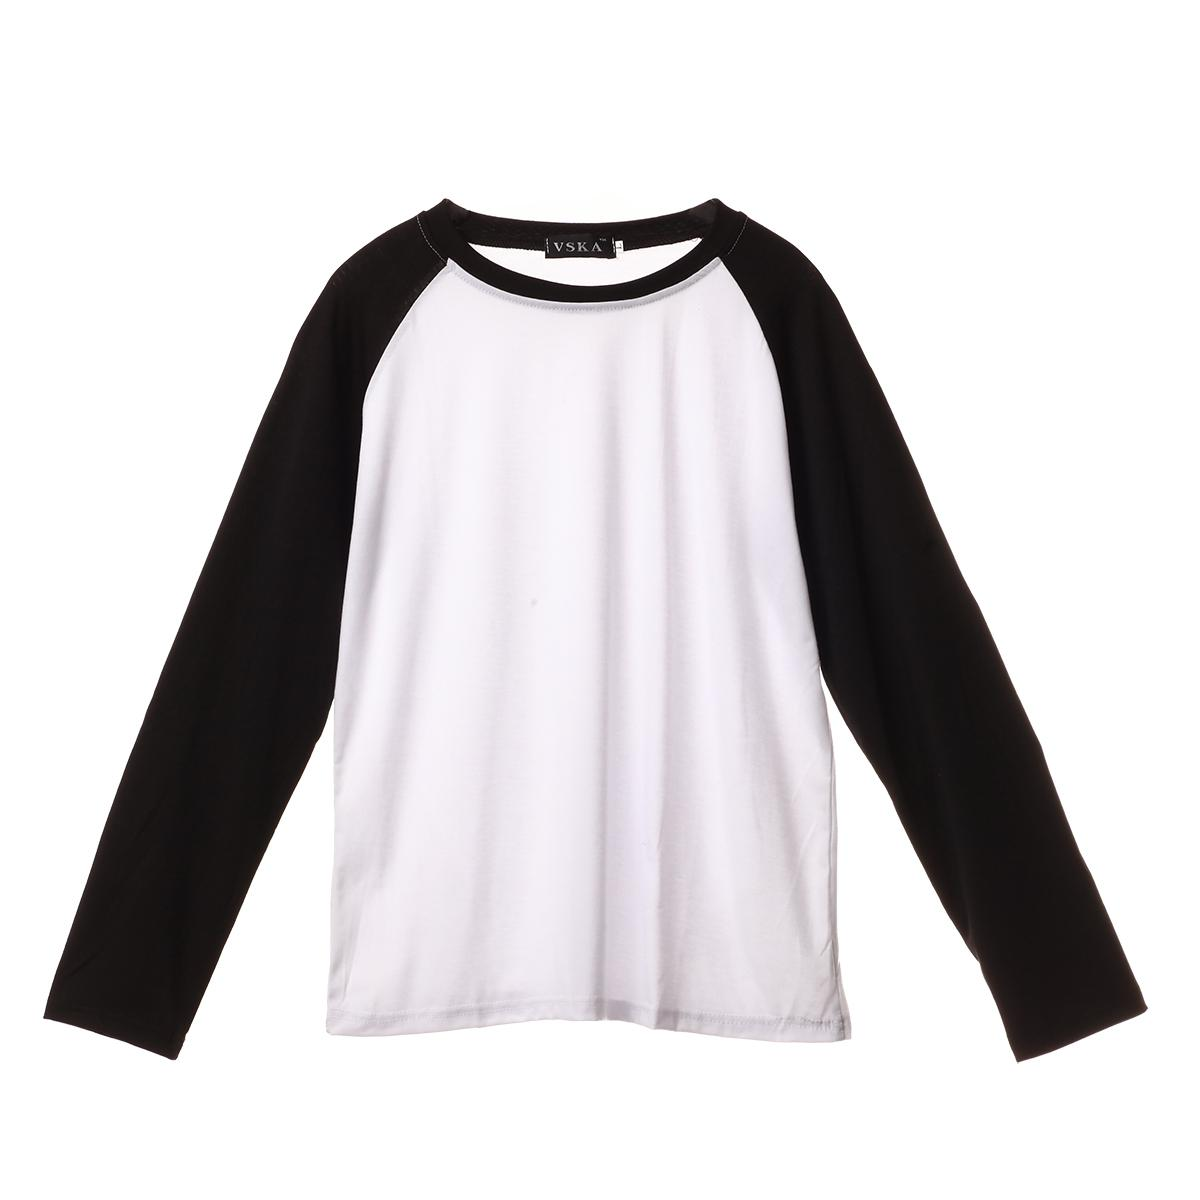 Correndo t-shirt manga comprida Plain Baseball Raglan T-shirt Tee Mens Sportswear Equipe 5 cores R Neck U